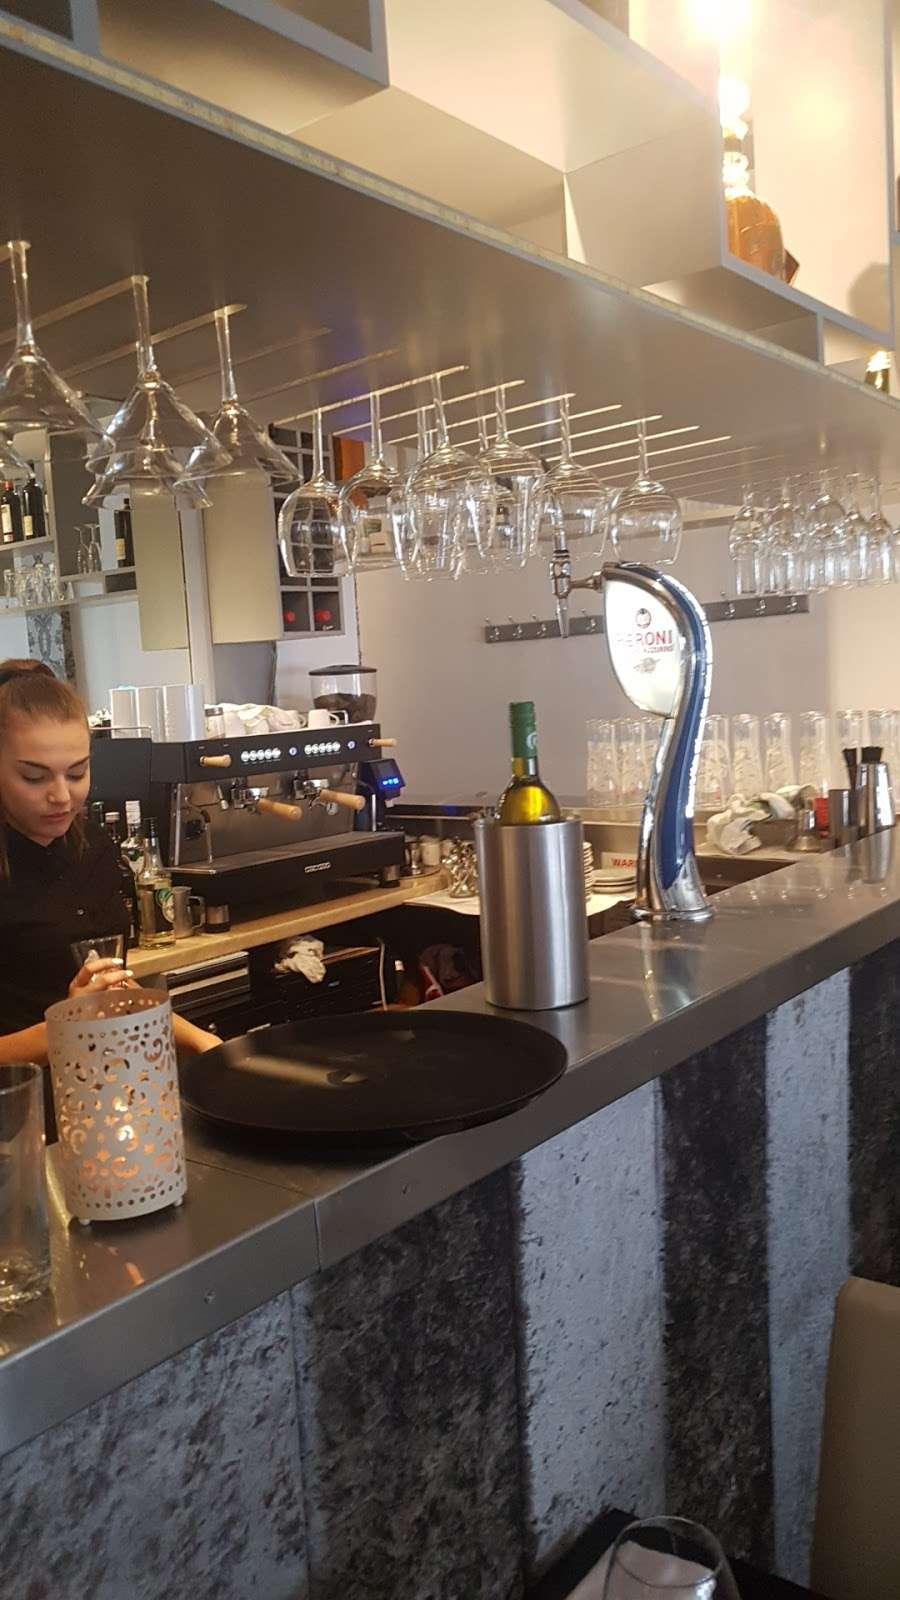 Riennas Restaurant - restaurant  | Photo 6 of 10 | Address: 210-176, A124, Hornchurch RM12 6QP, UK | Phone: 01708 469463